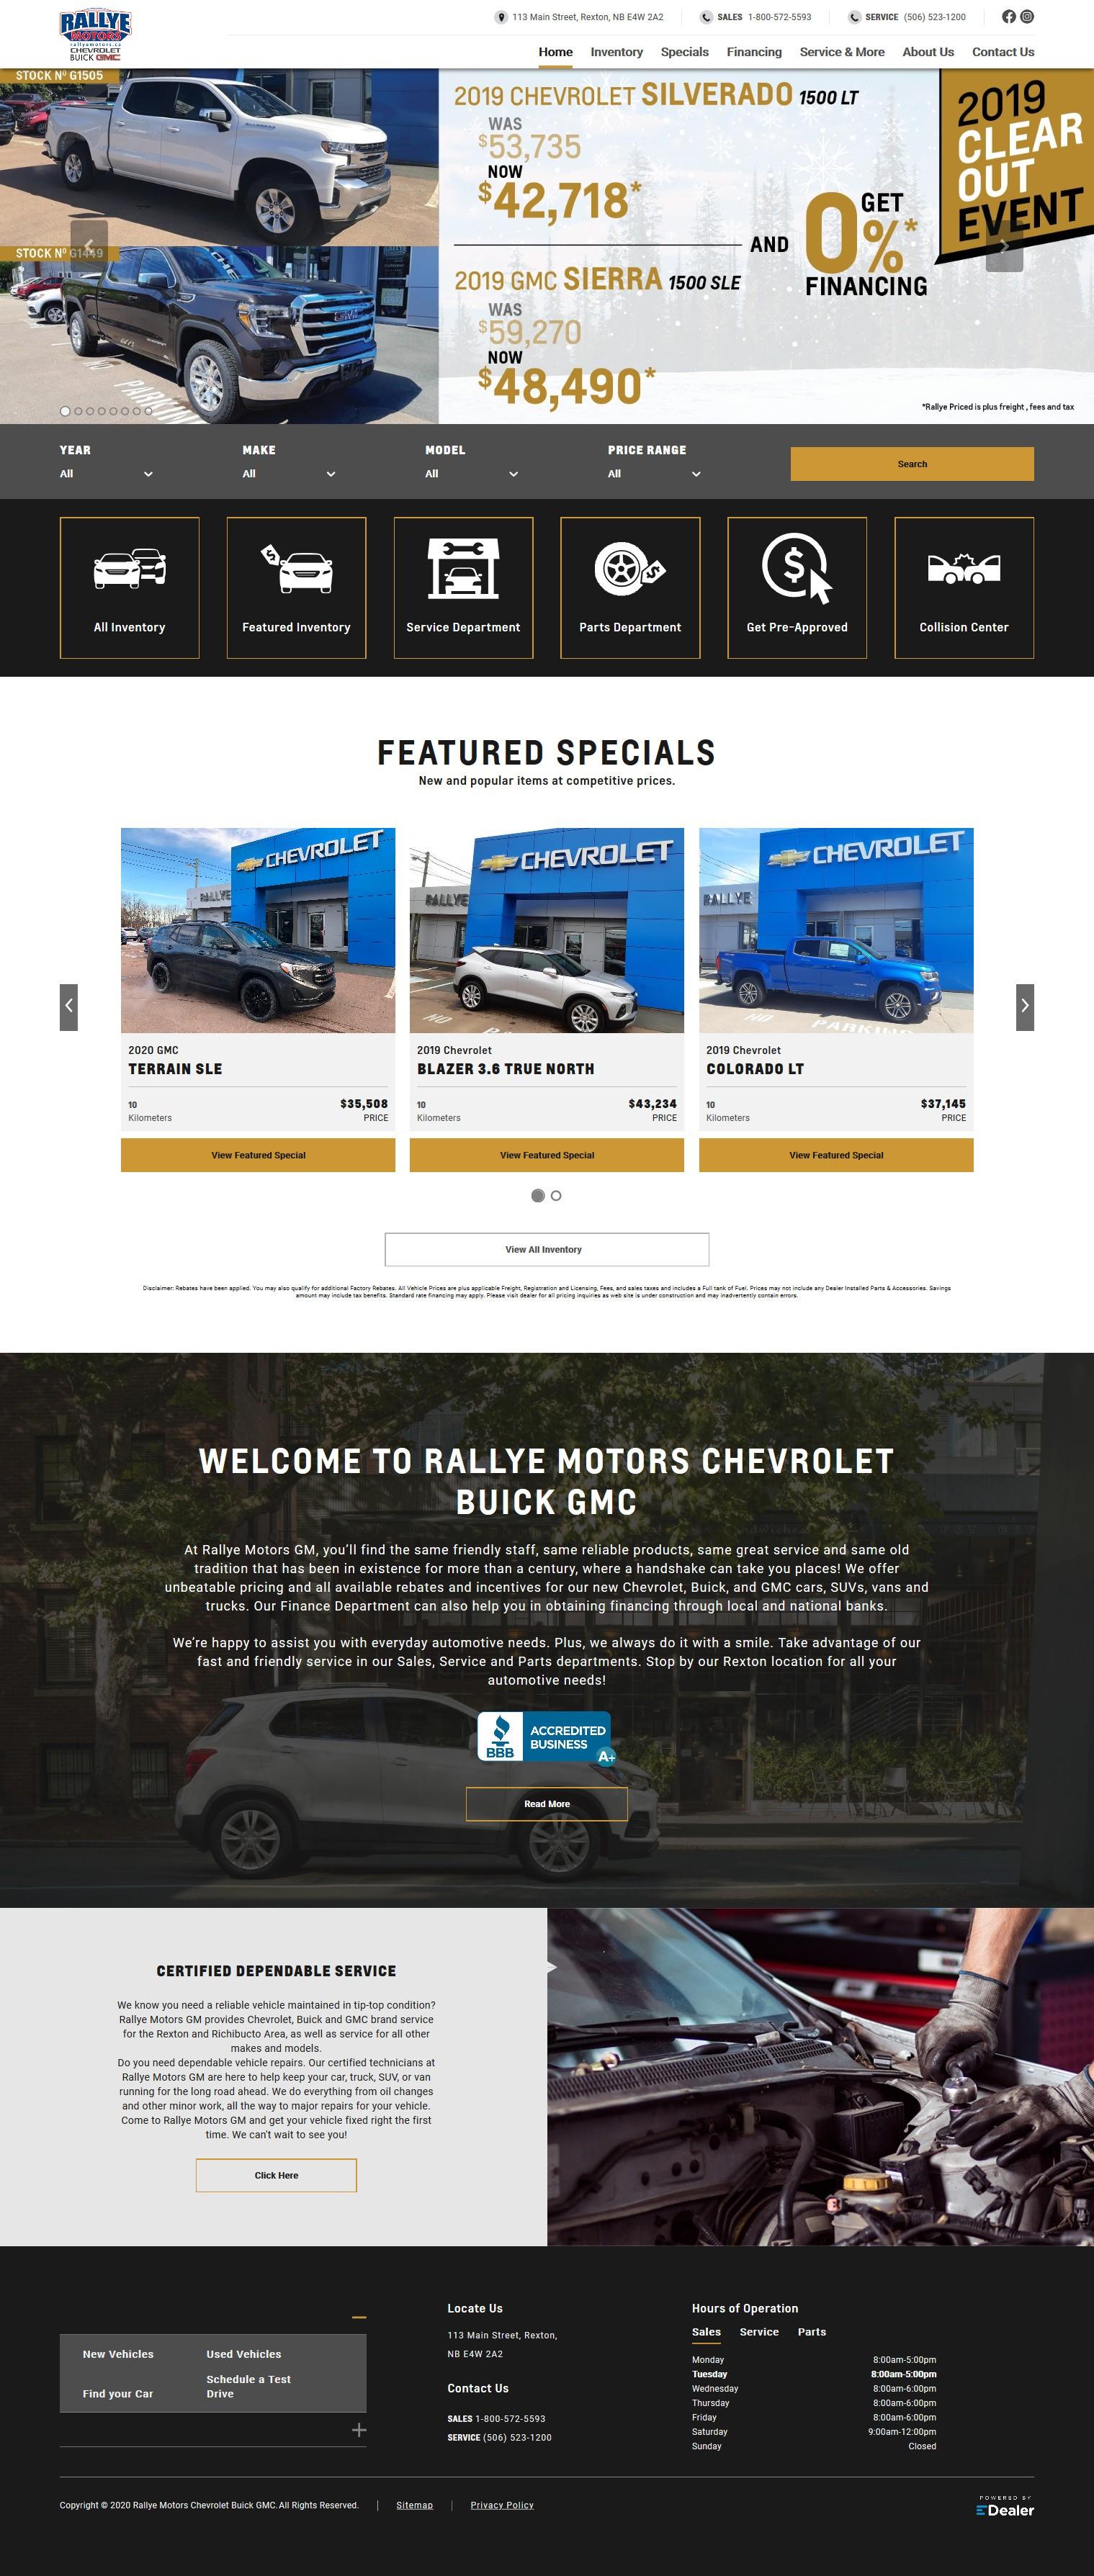 Rallye Motors Chevrolet Buick GMC